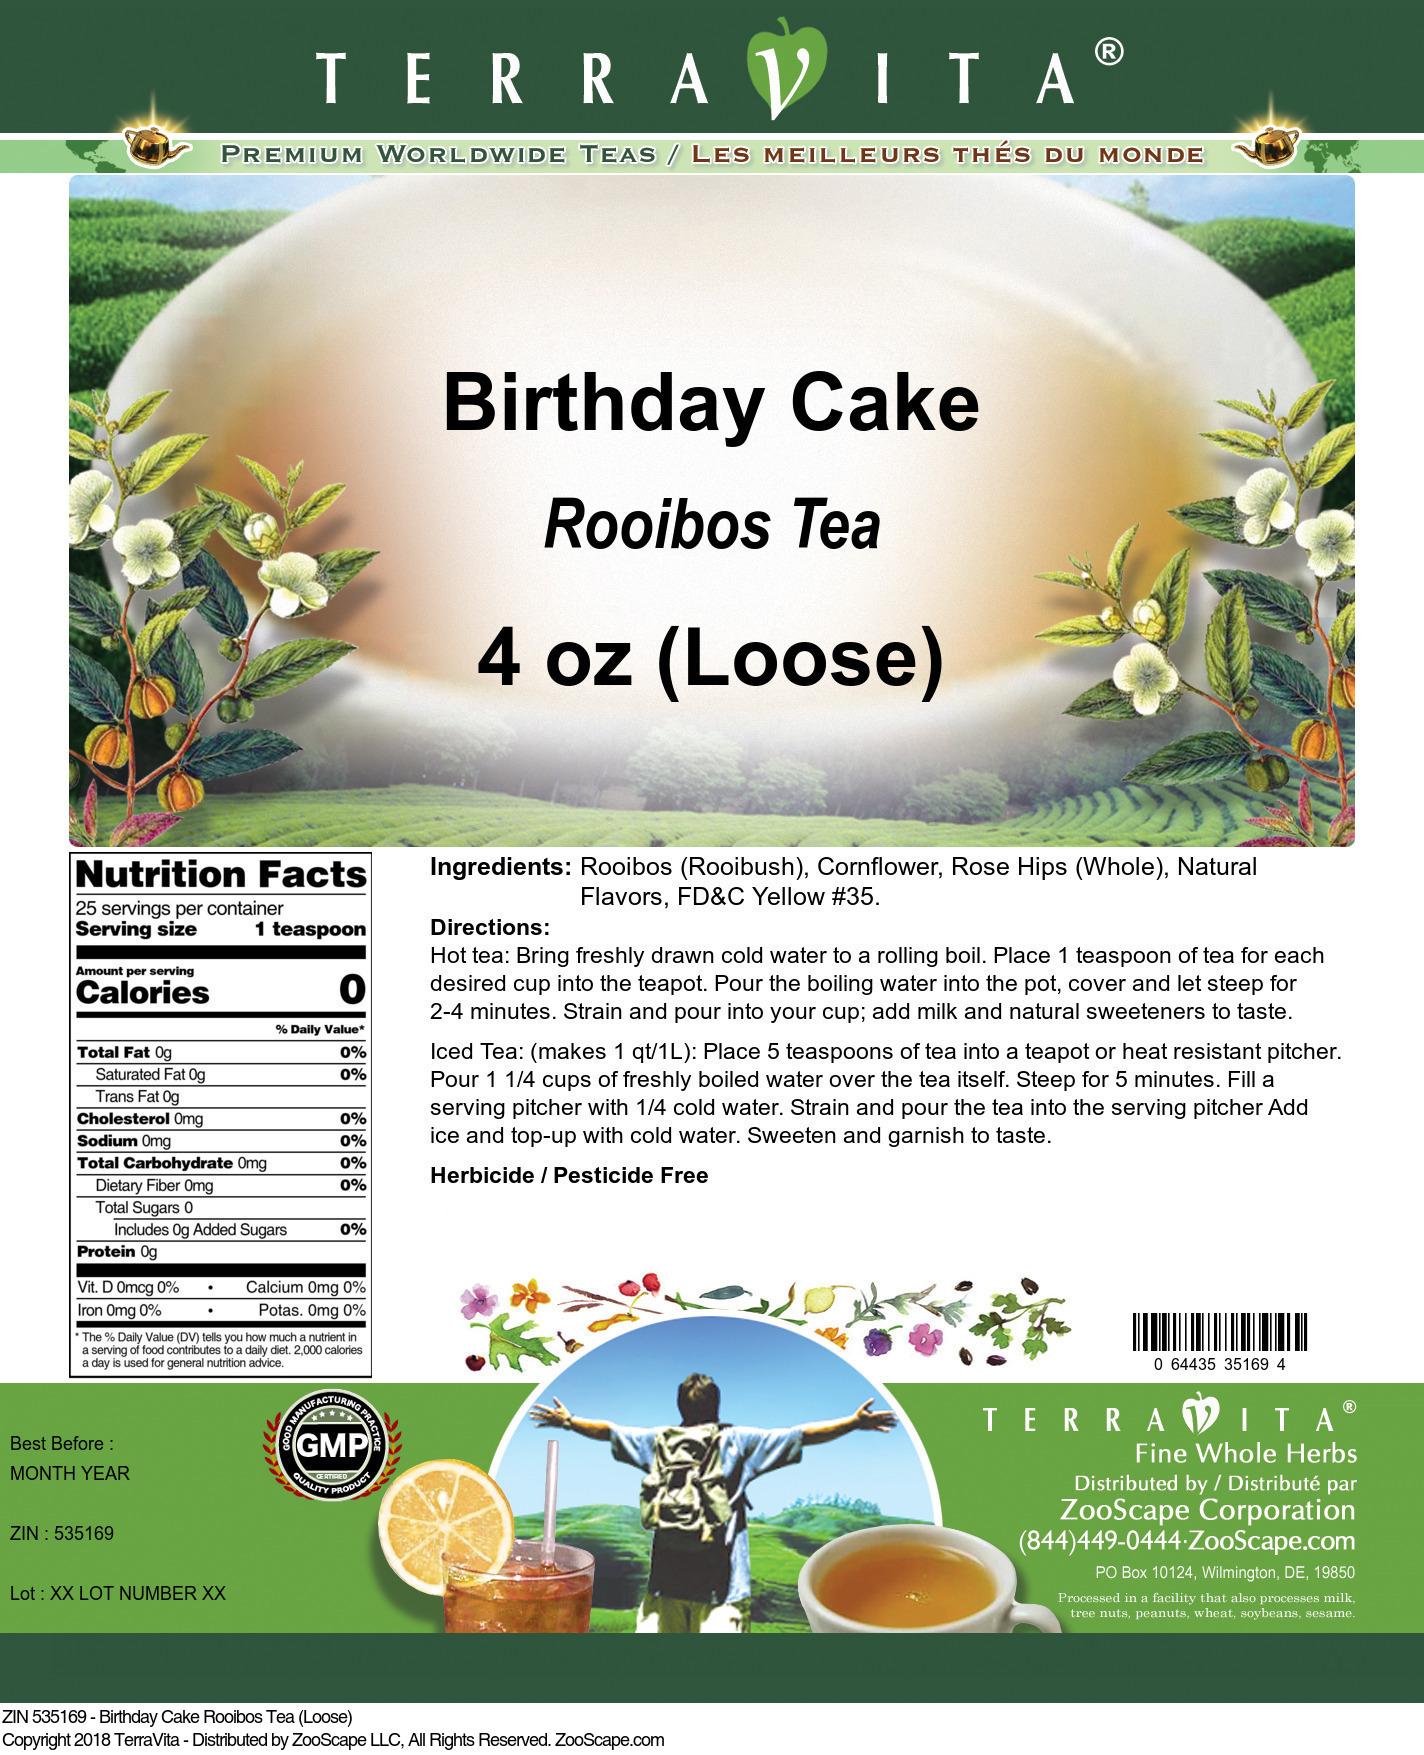 Birthday Cake Rooibos Tea (Loose)